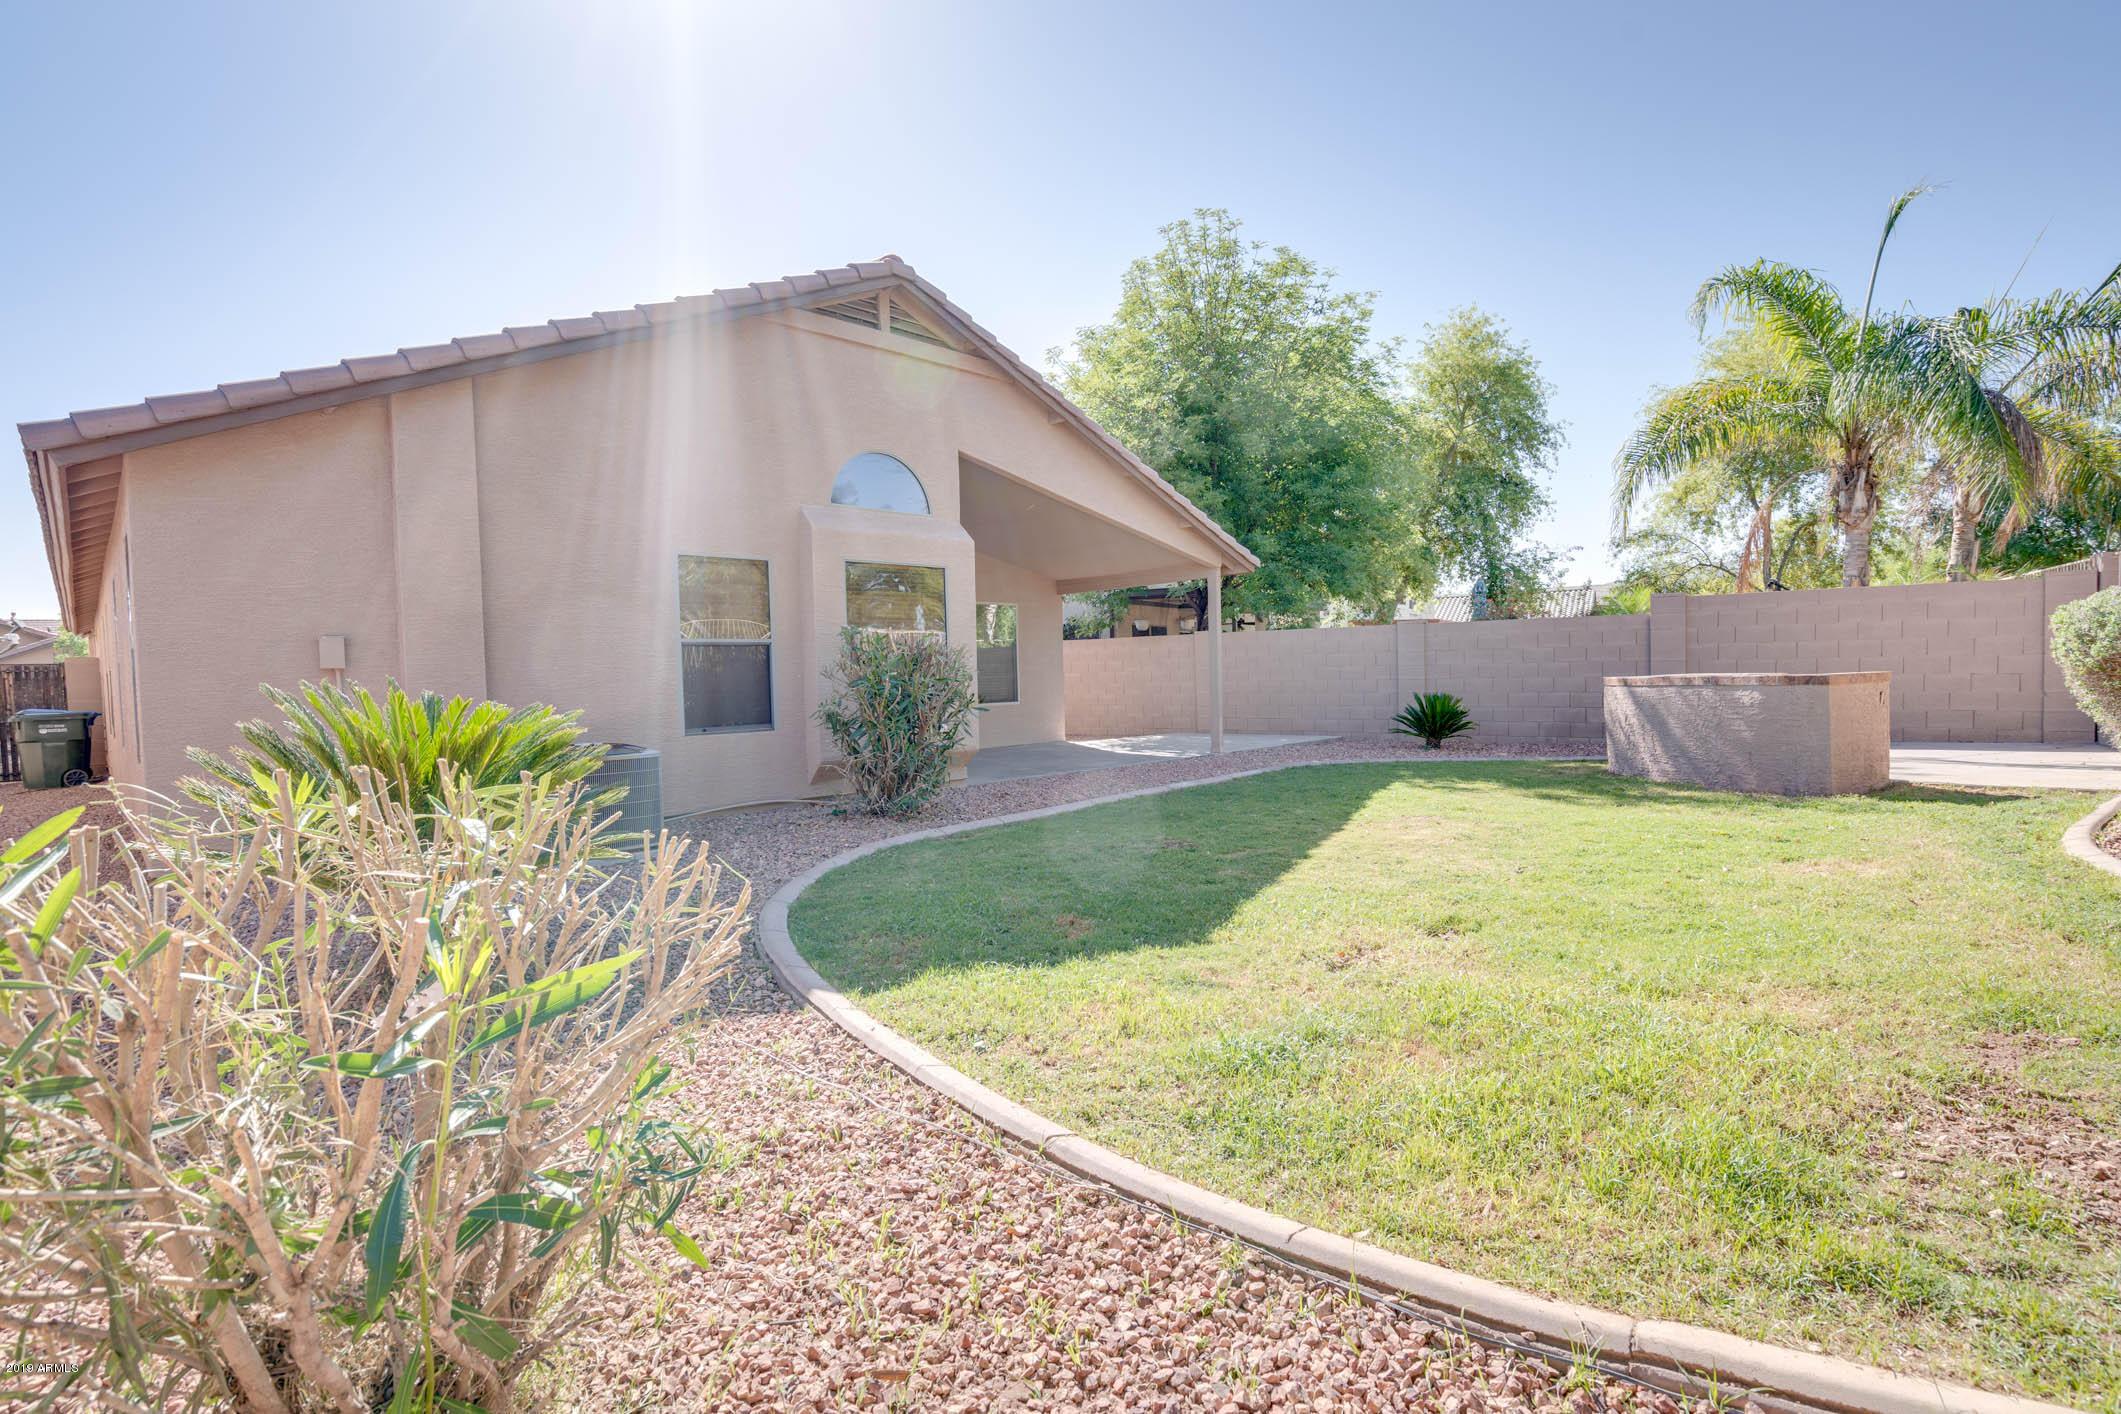 MLS 5927480 7830 S 46TH Lane, Laveen, AZ 85339 Laveen AZ Cheatham Farms